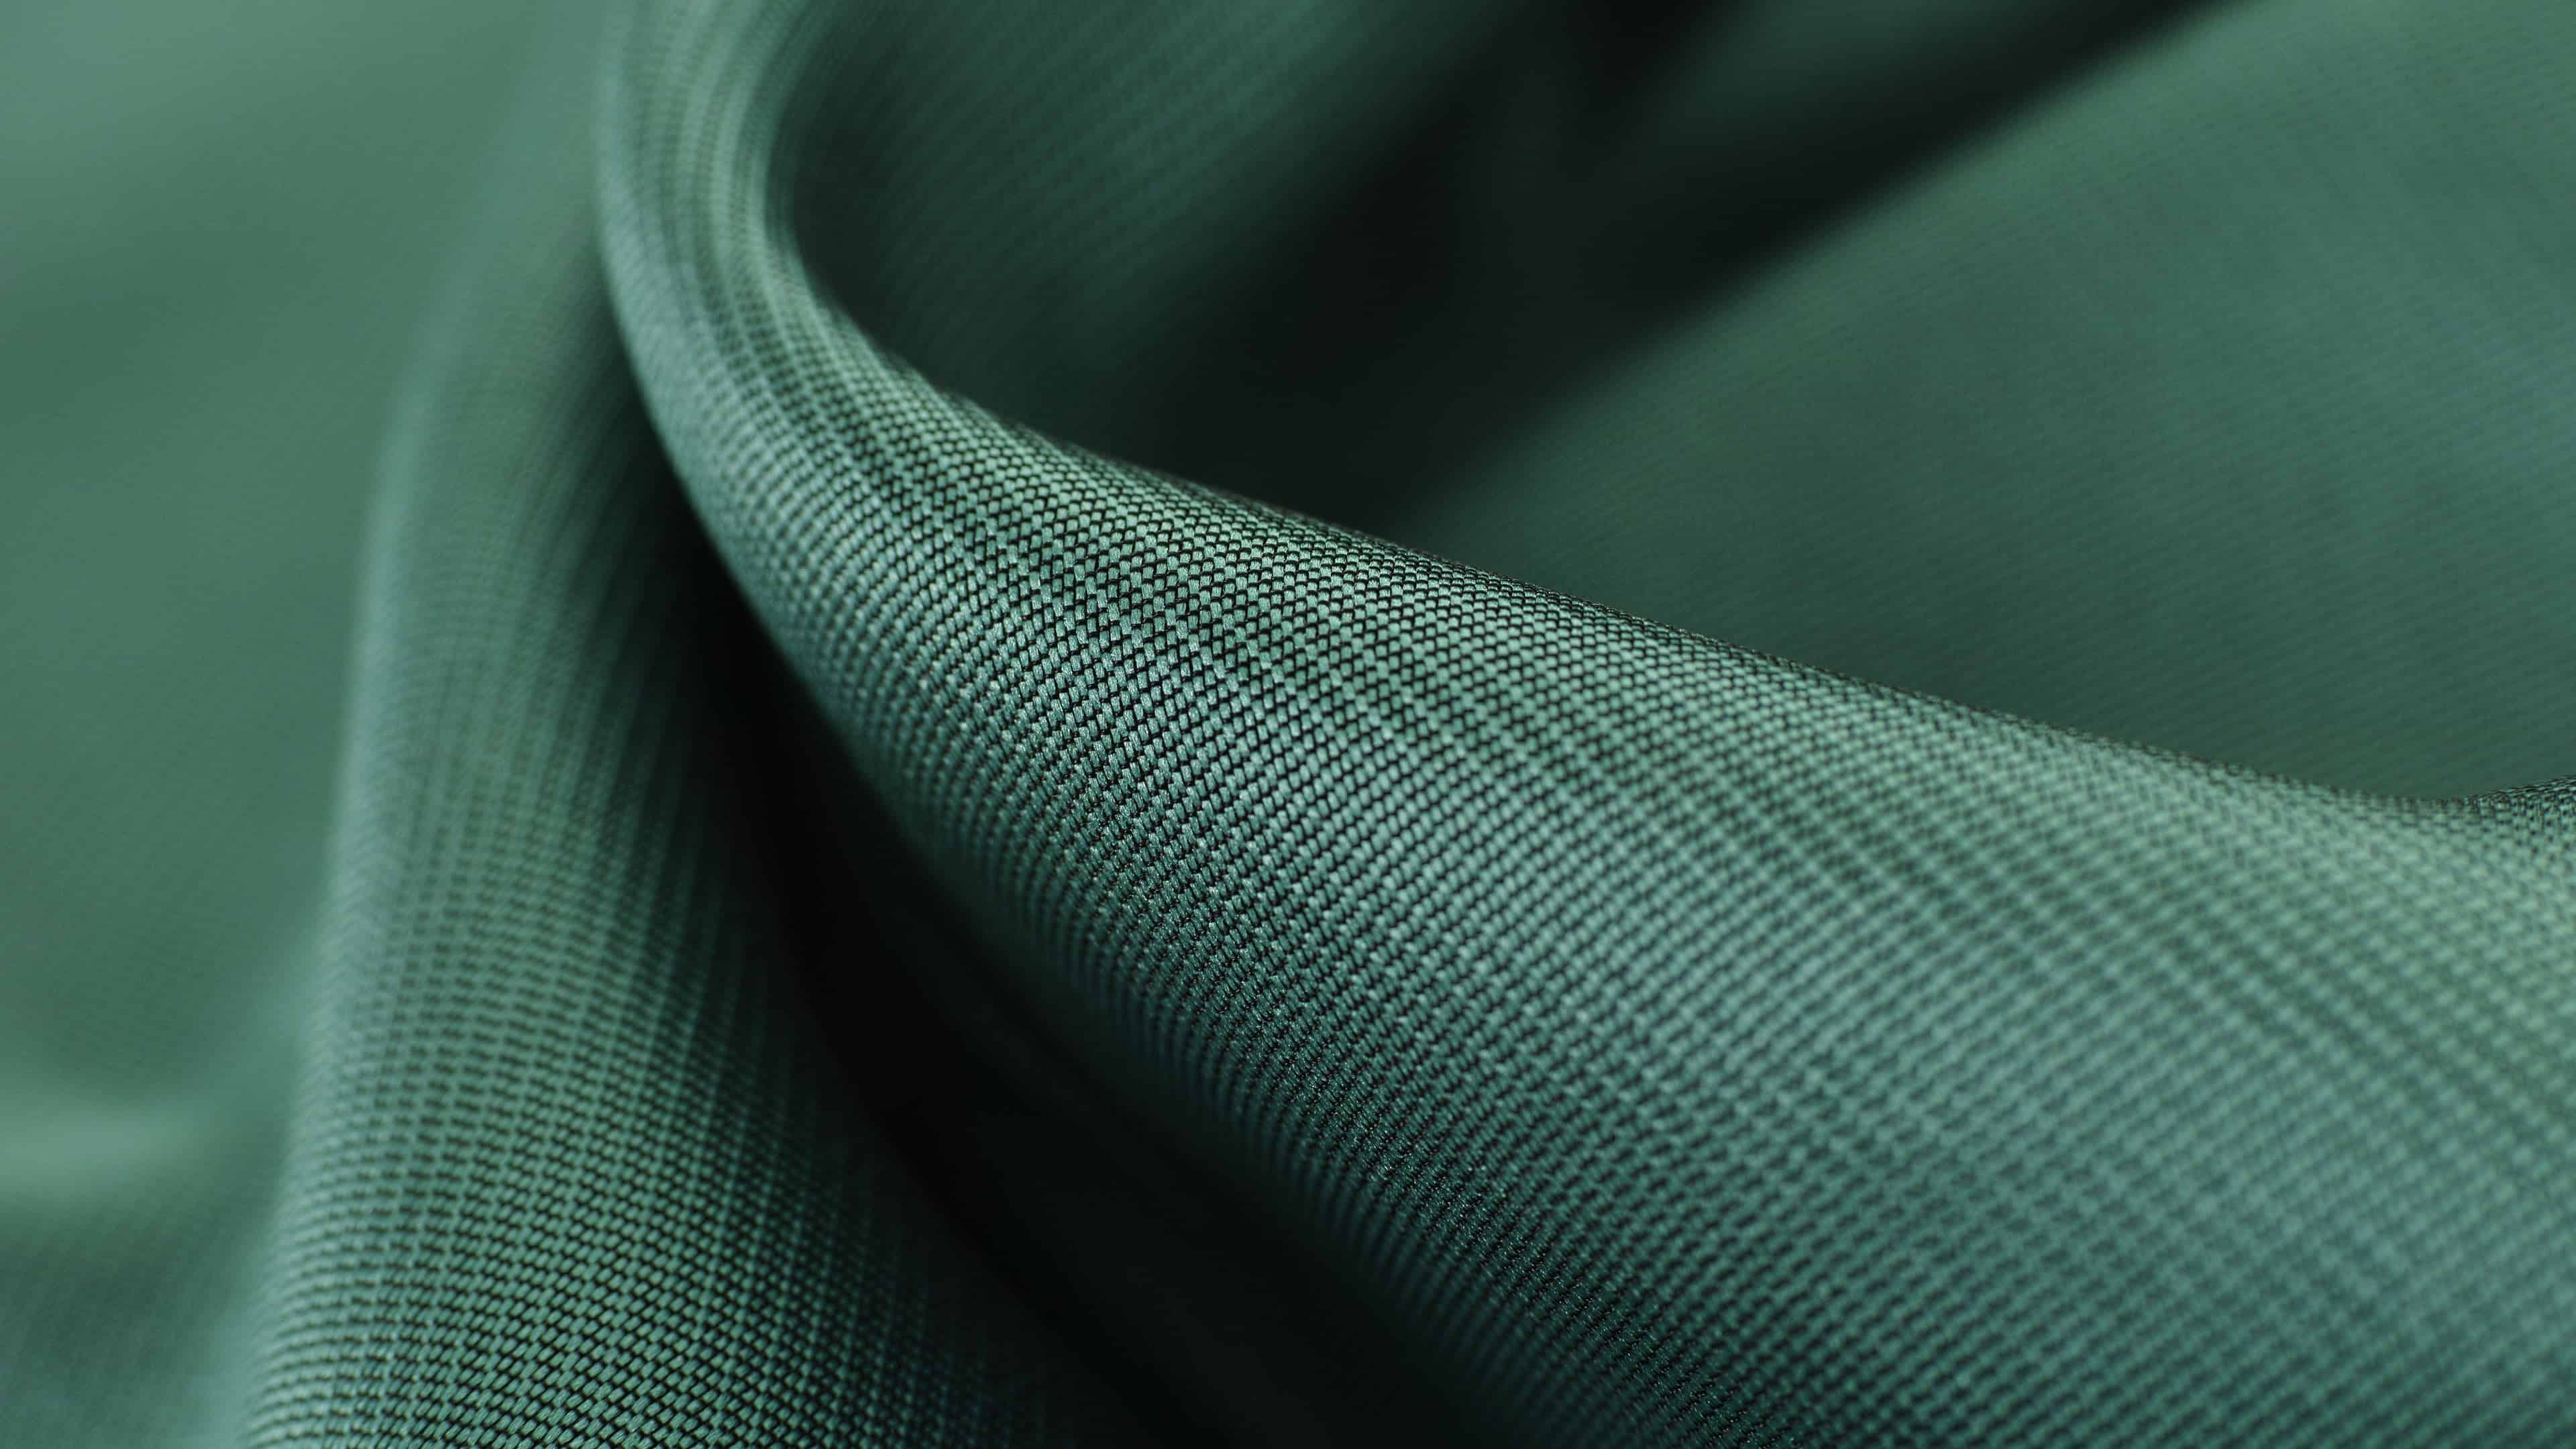 green fabric uhd 4k wallpaper